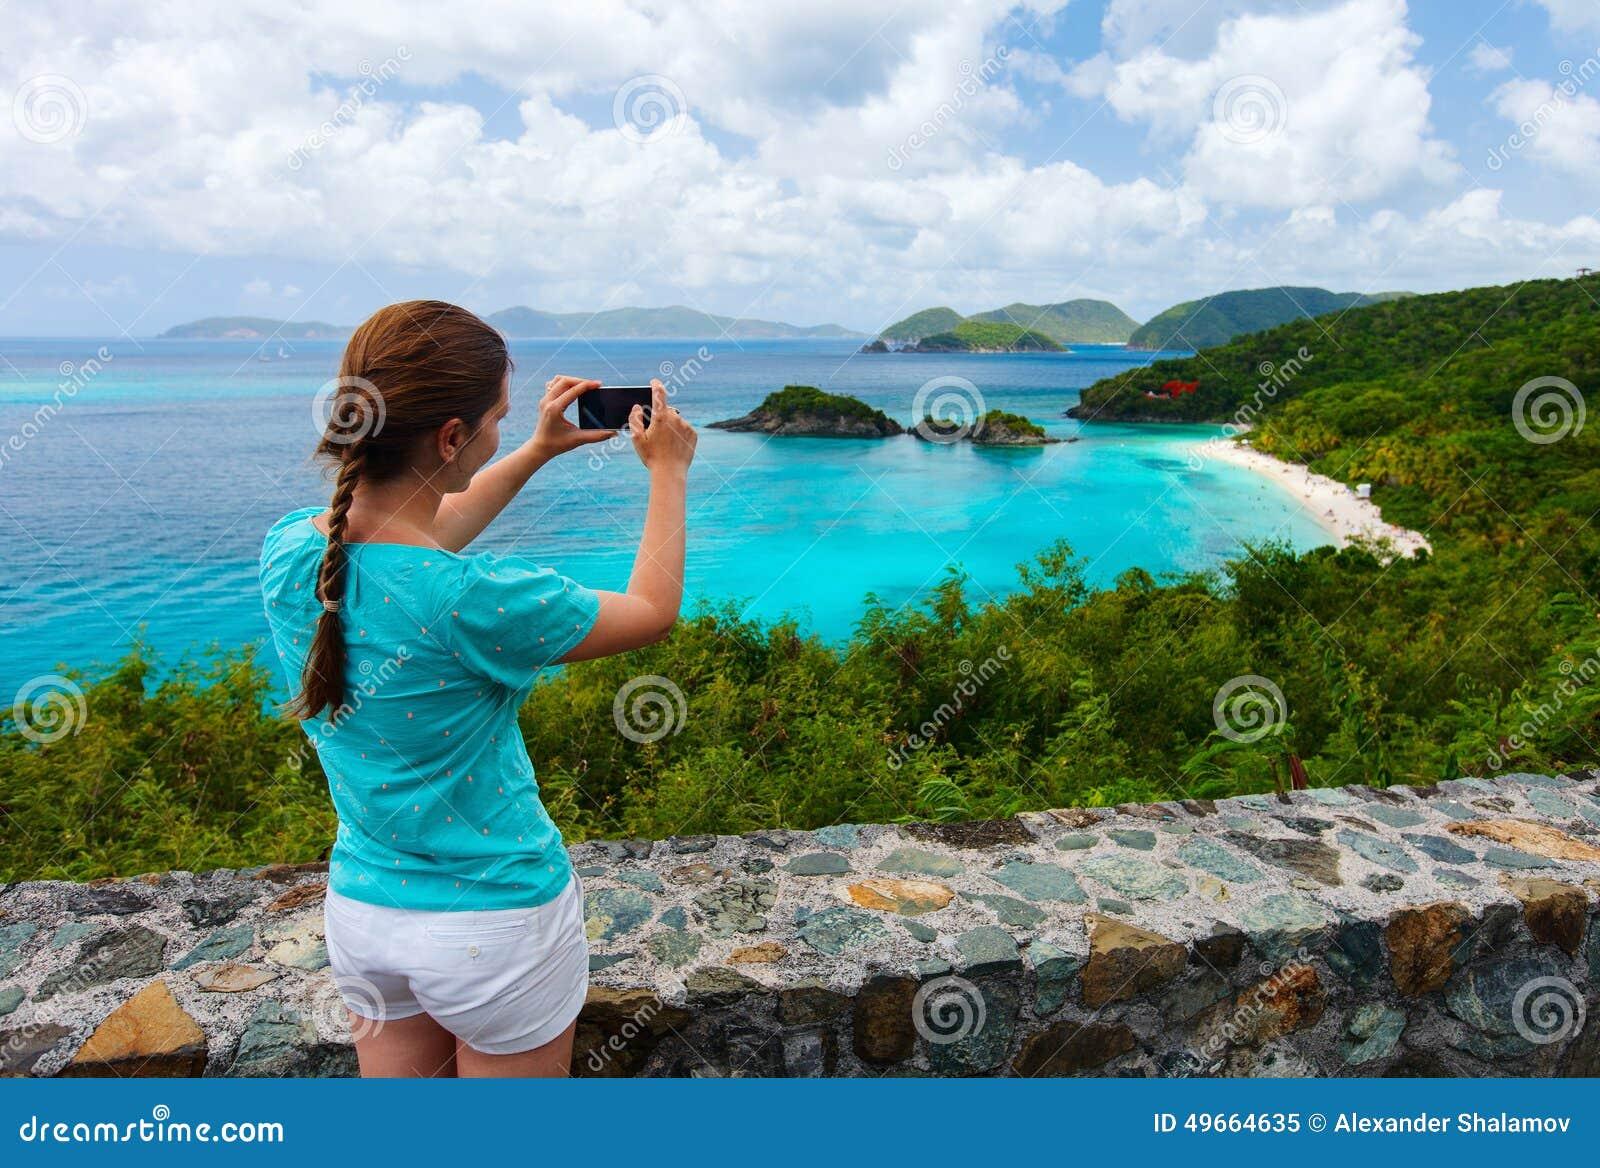 Virgin islands girls